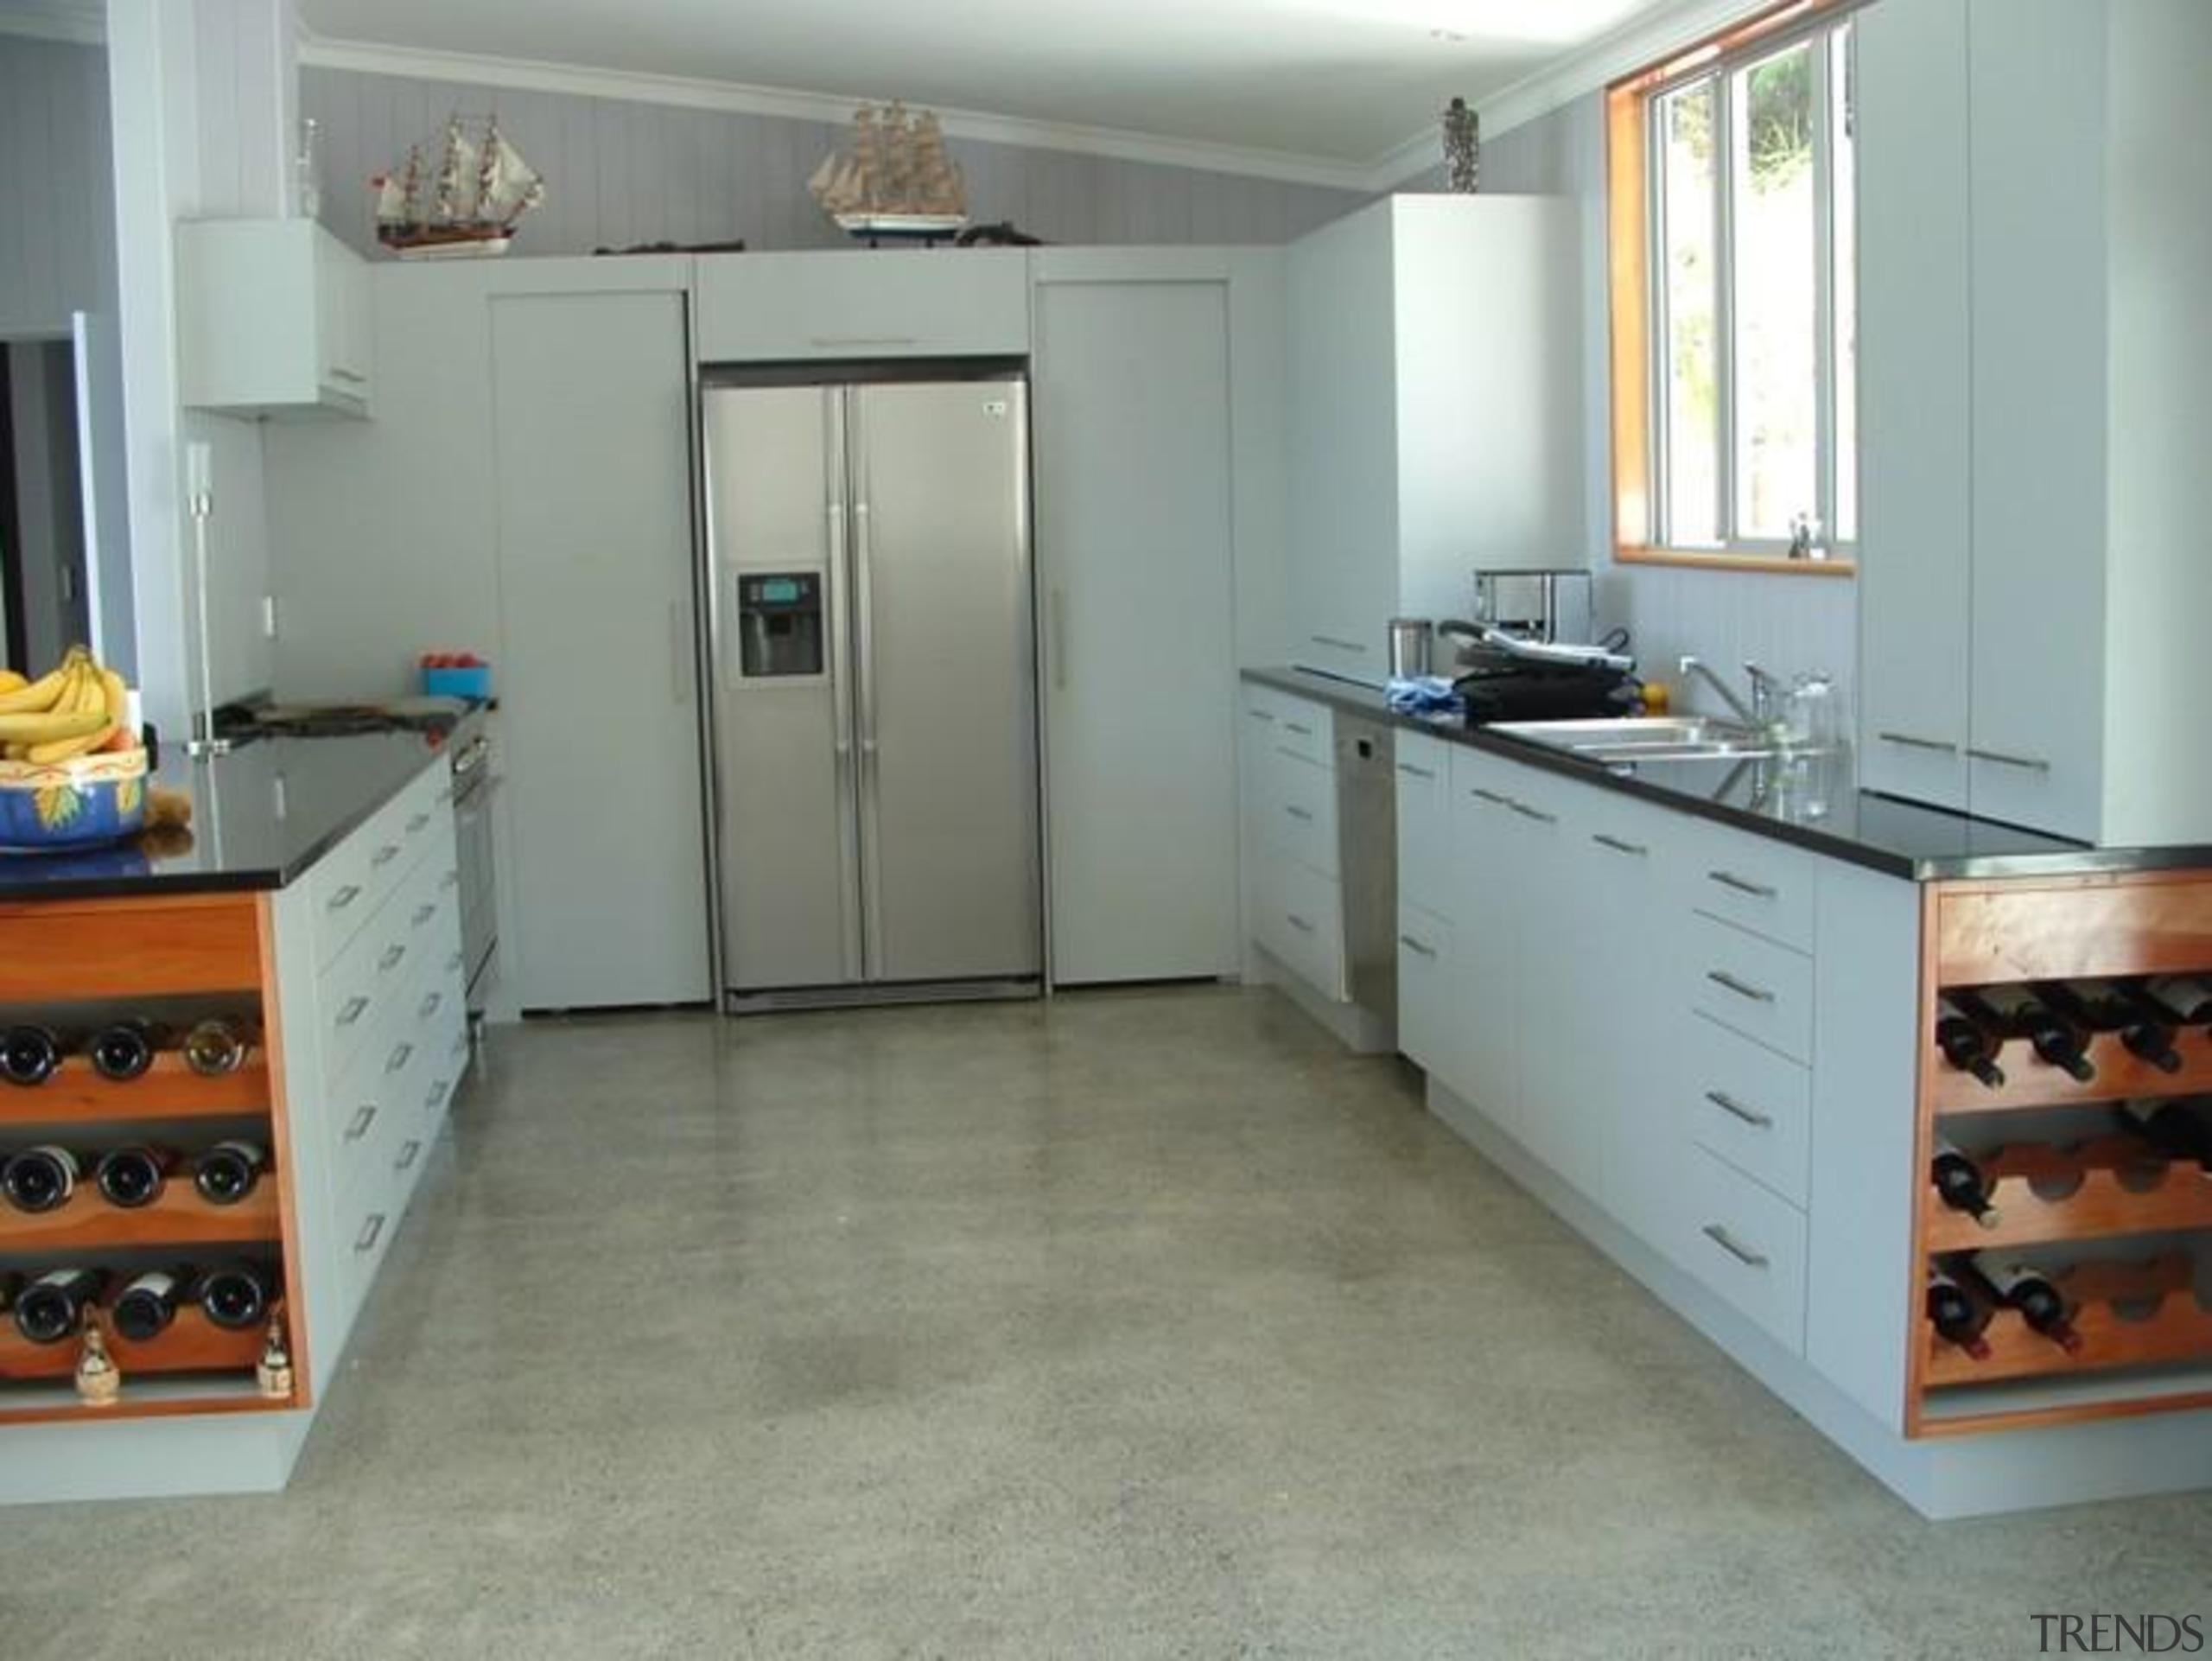 Longbeach Home 2 - cabinetry | countertop | cabinetry, countertop, floor, flooring, hardwood, kitchen, room, tile, gray